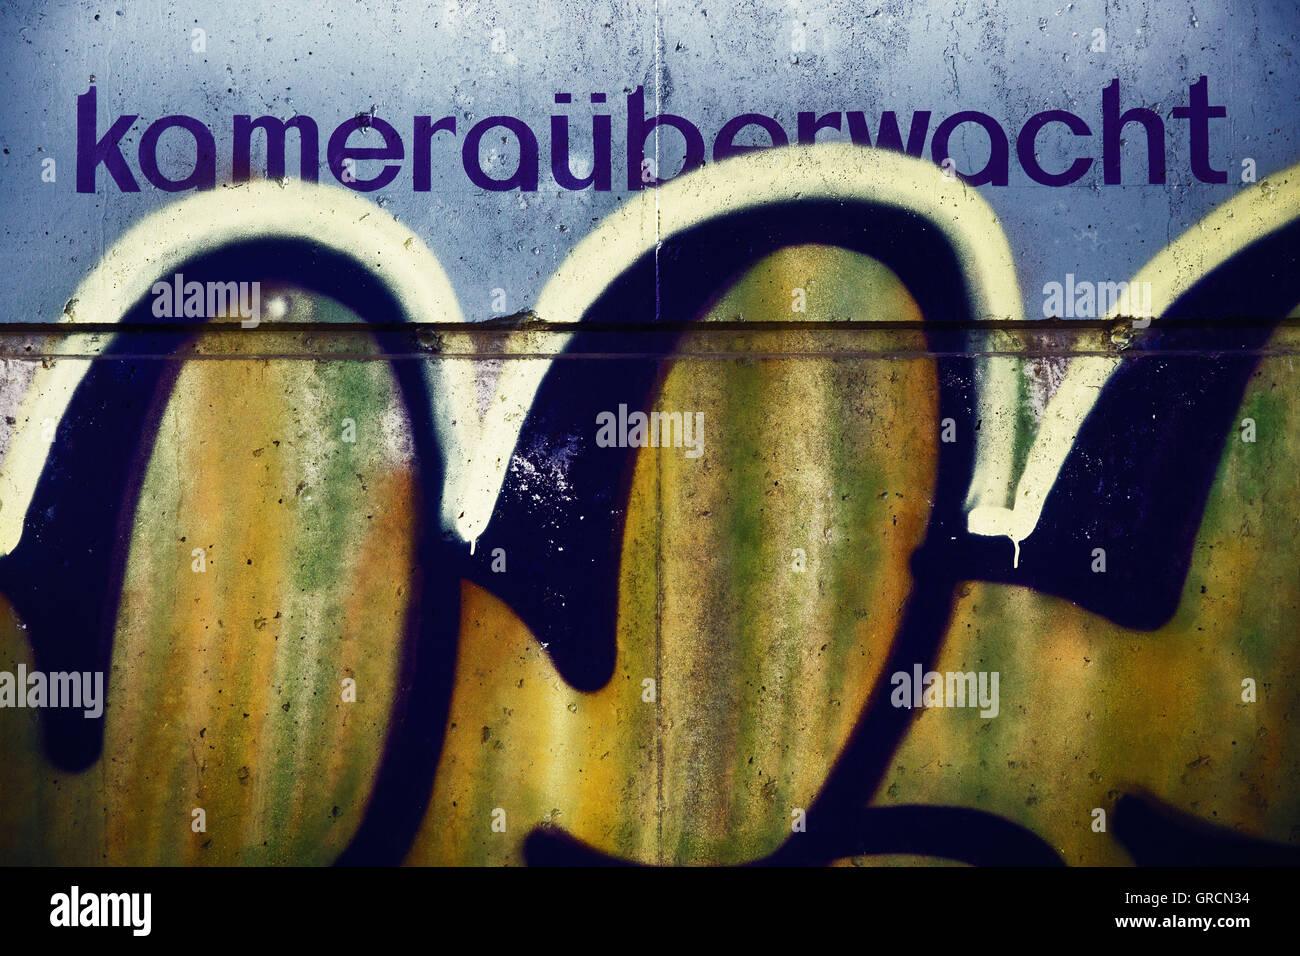 Note Camera Surveillance, Graffiti - Stock Image